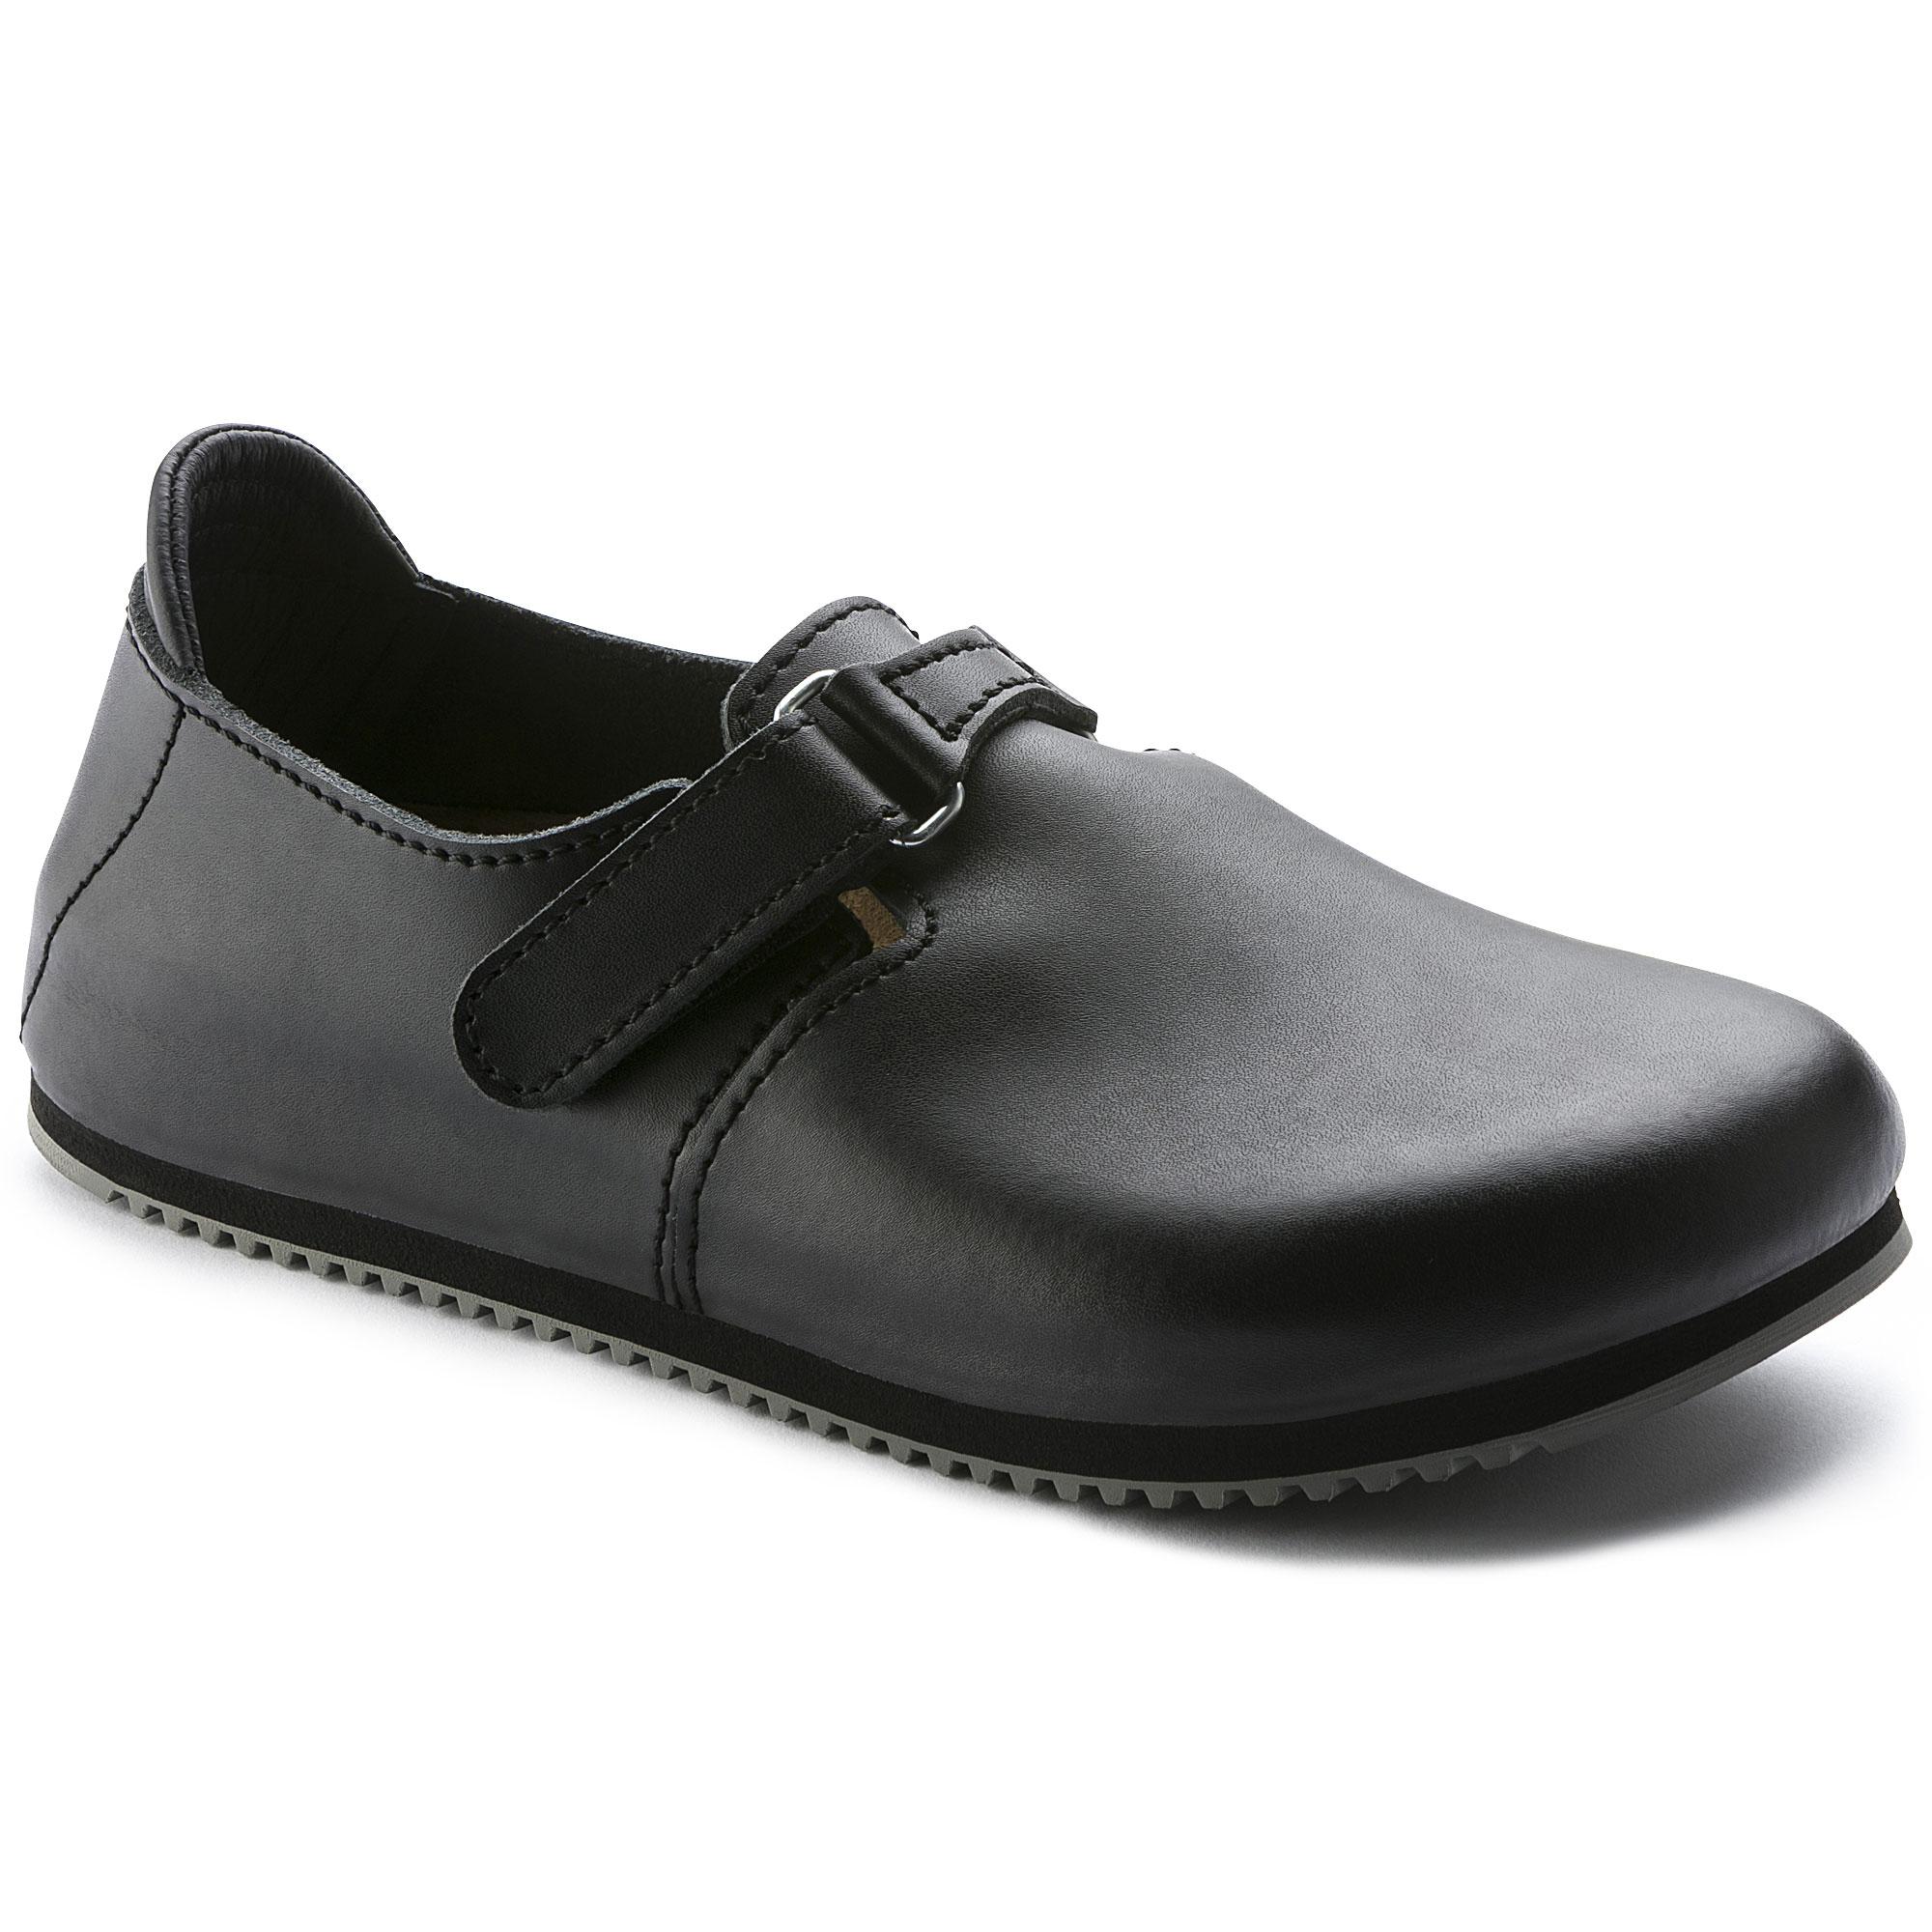 e90793c5c9b6 Linz Natural Leather Black ...